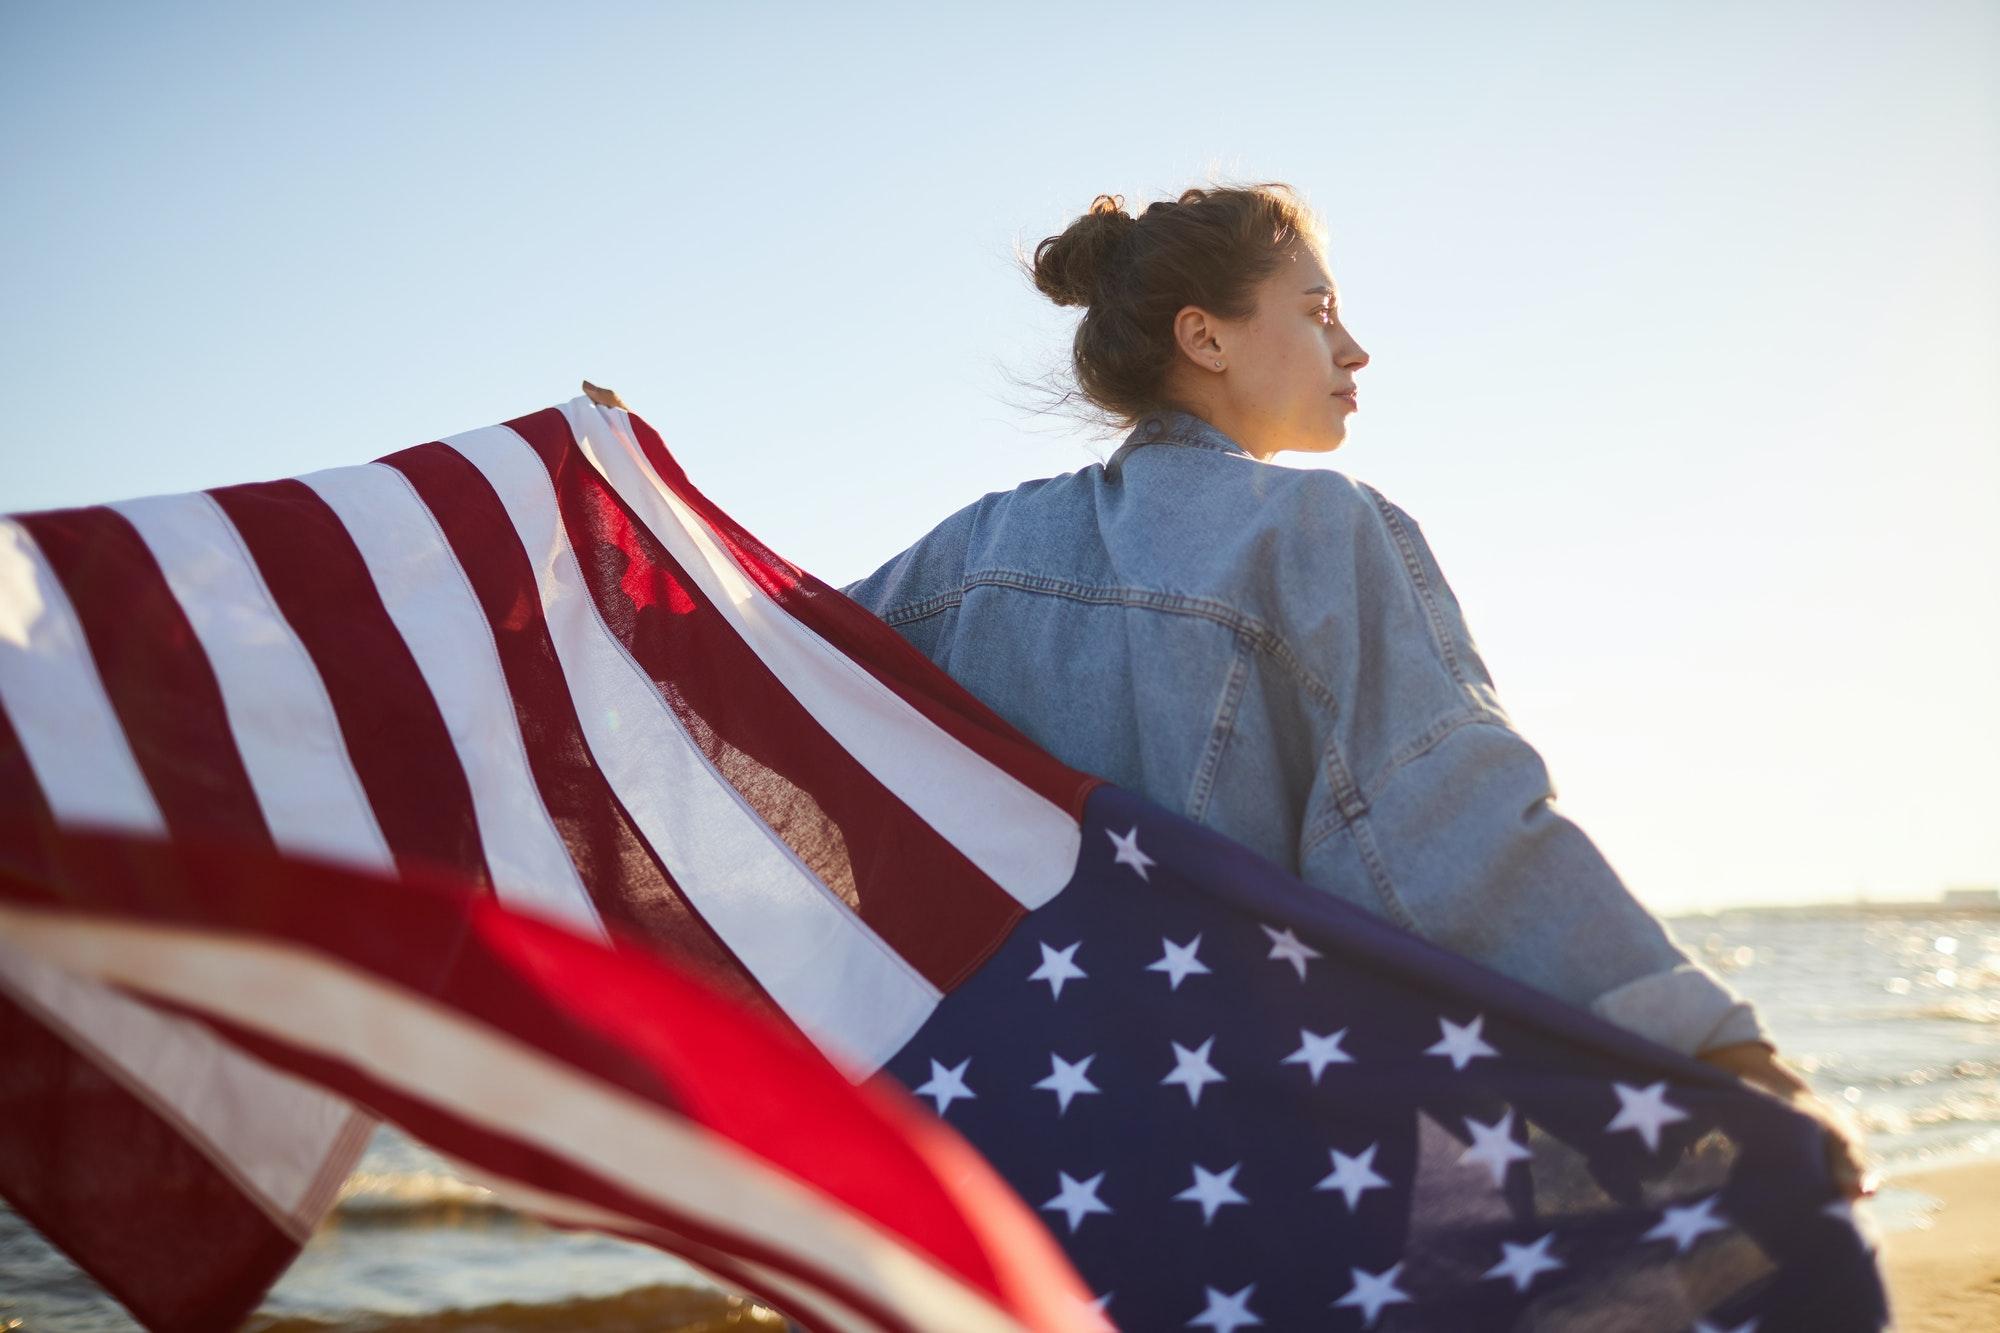 Thinking of America